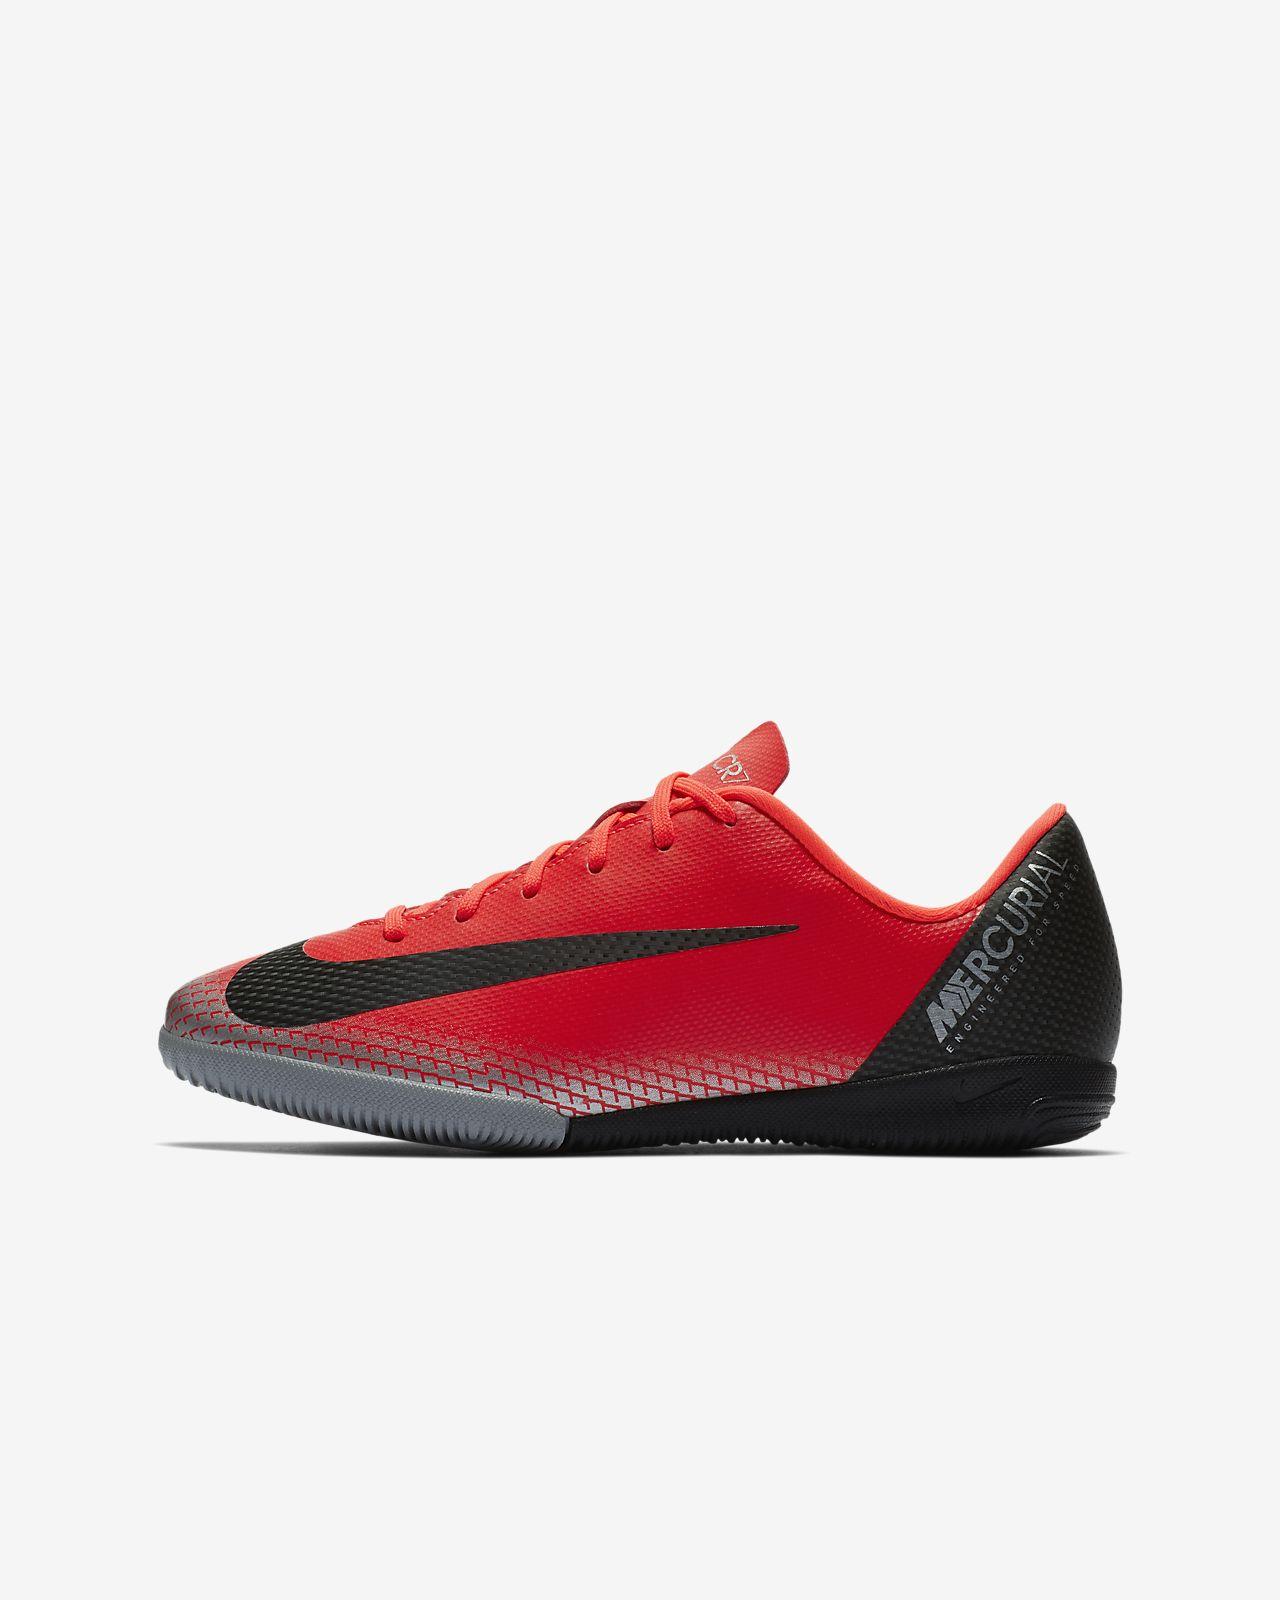 Nike Jr En Vapor Chaussure Xii Football Salle Academy Mercurialx De U6q4xZwpR